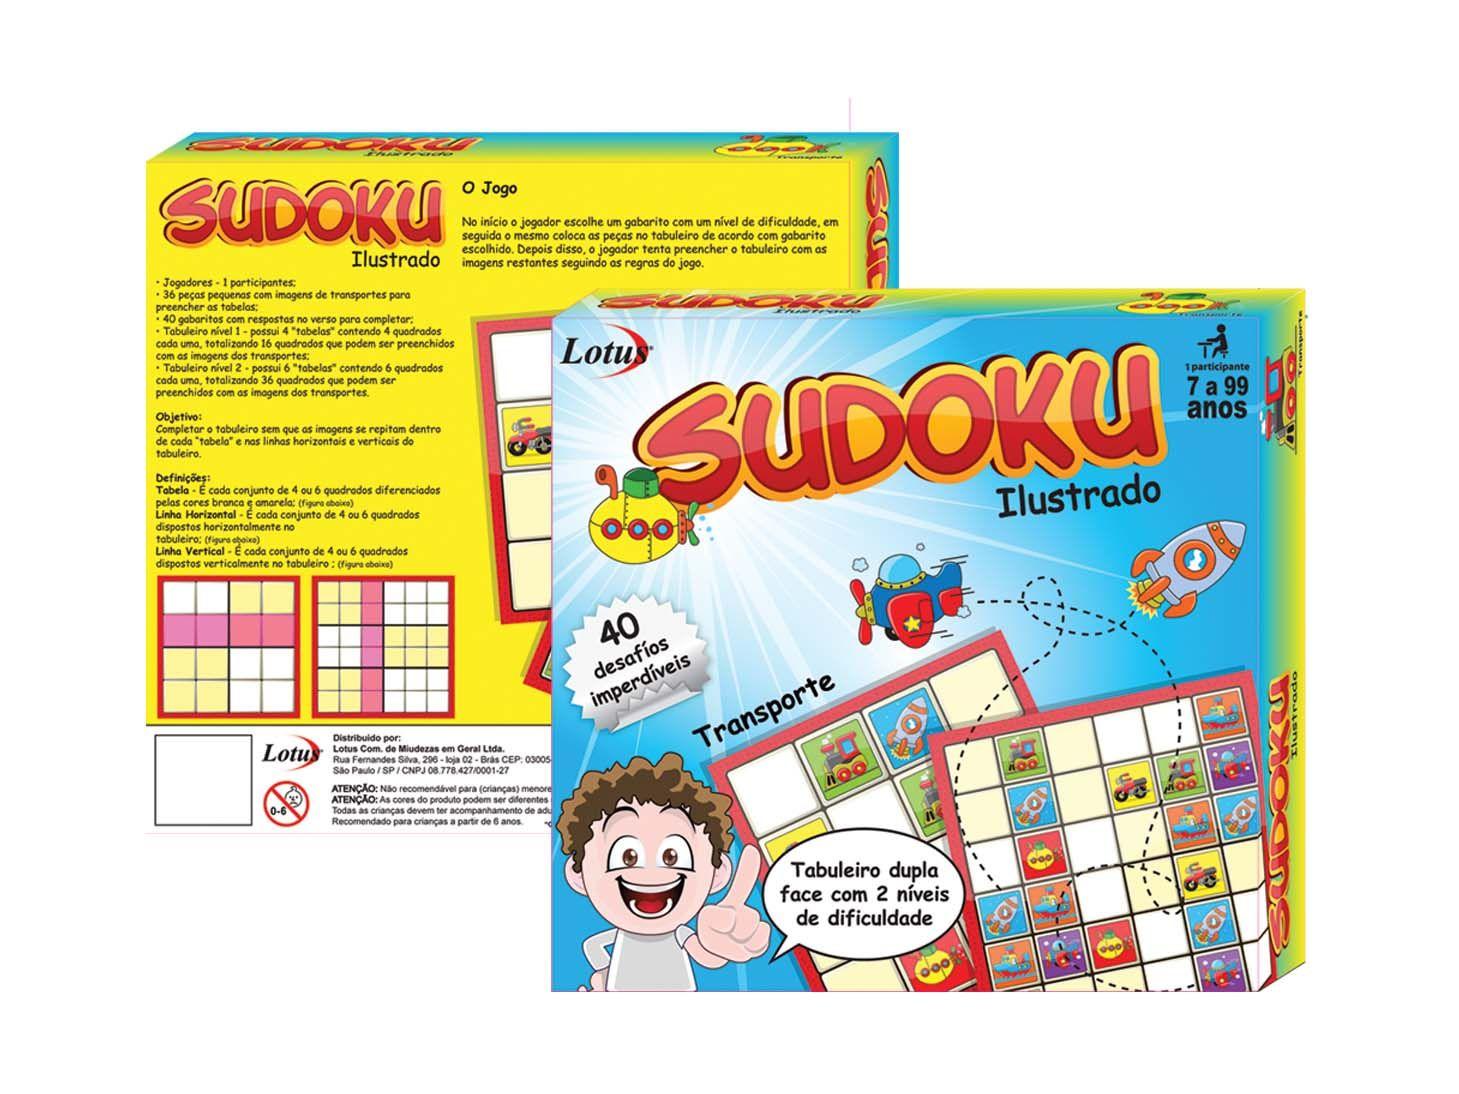 Sudoku Ilustrado Divertido Colorido - SK - 1156